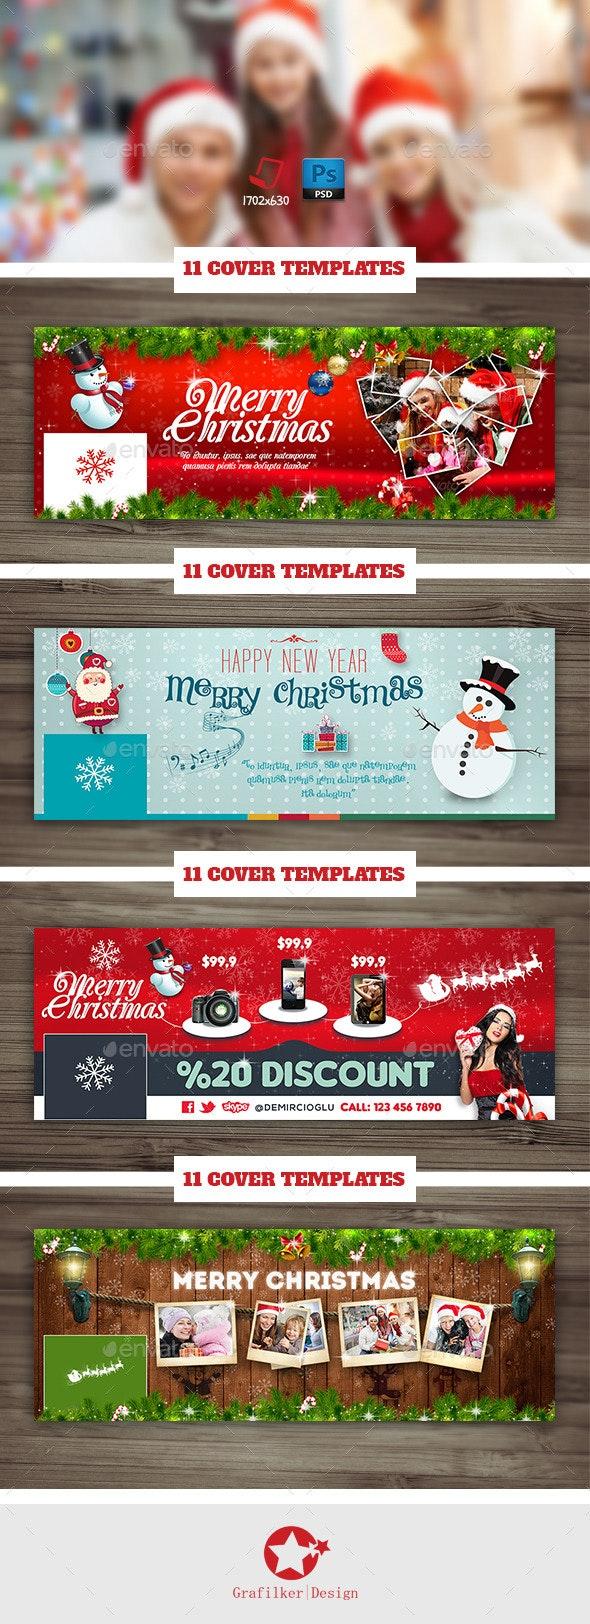 Christmas Timeline Cover Bundle Templates - Facebook Timeline Covers Social Media